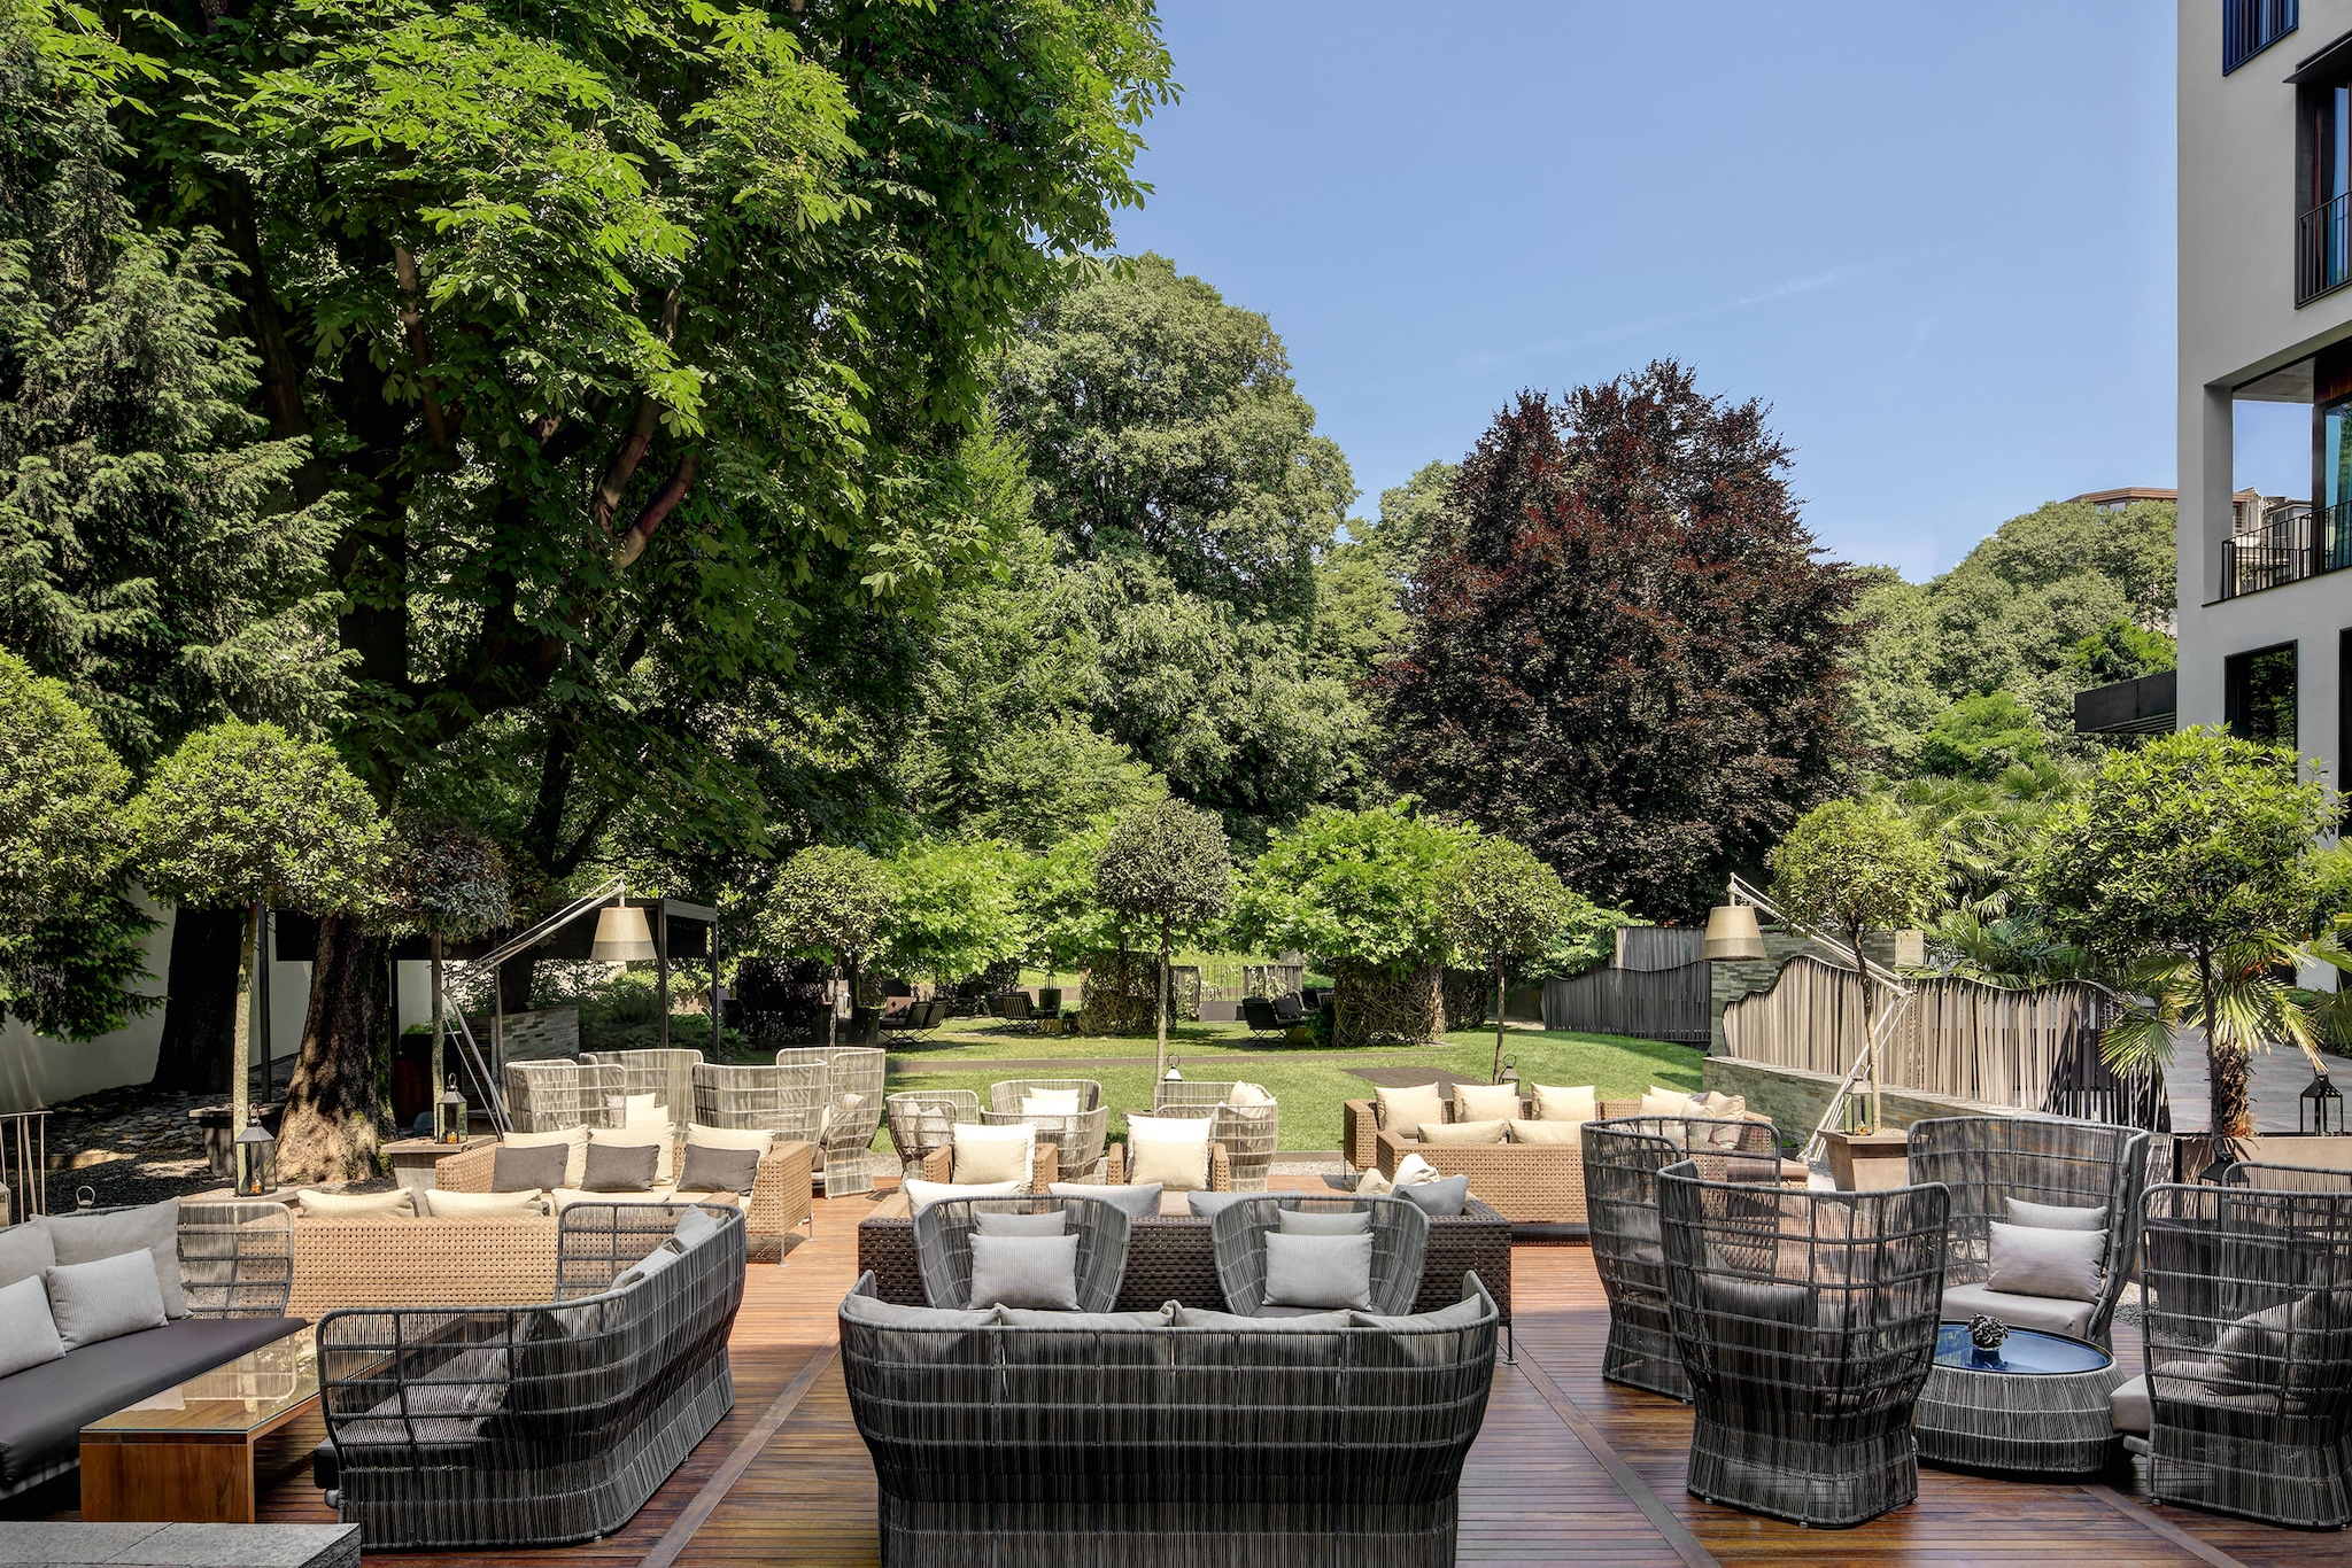 B&B Italia Outdoor arreda il giardino del Bulgari Hotel Milano